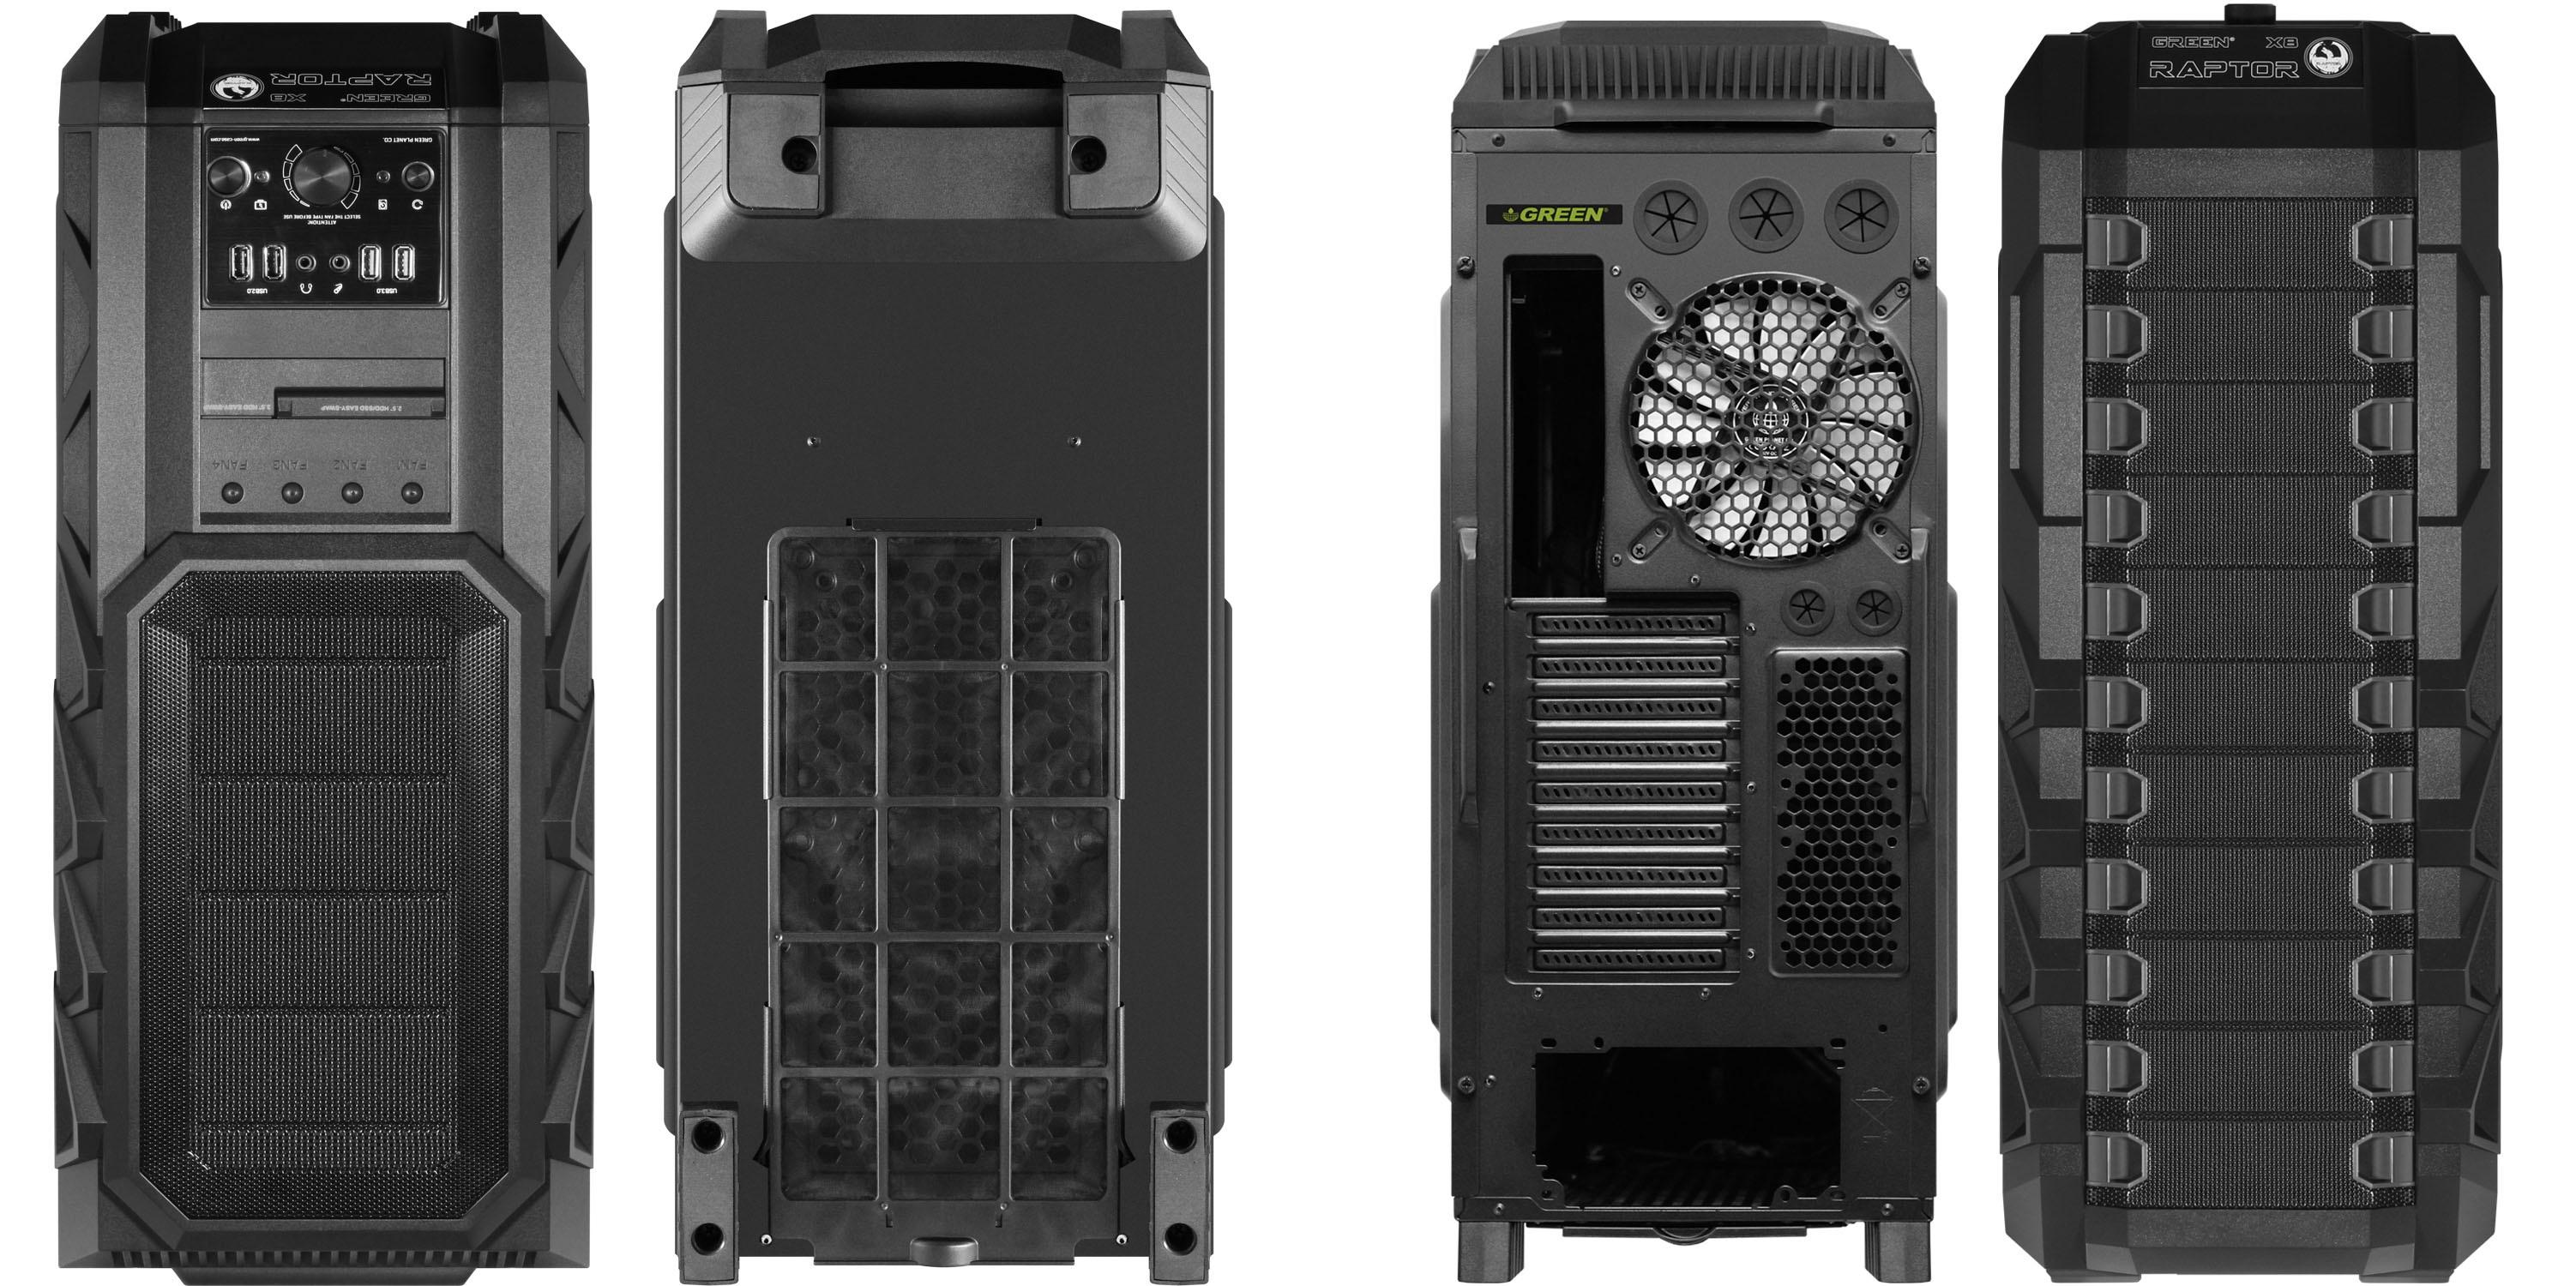 Green X8 Raptor Cooling System